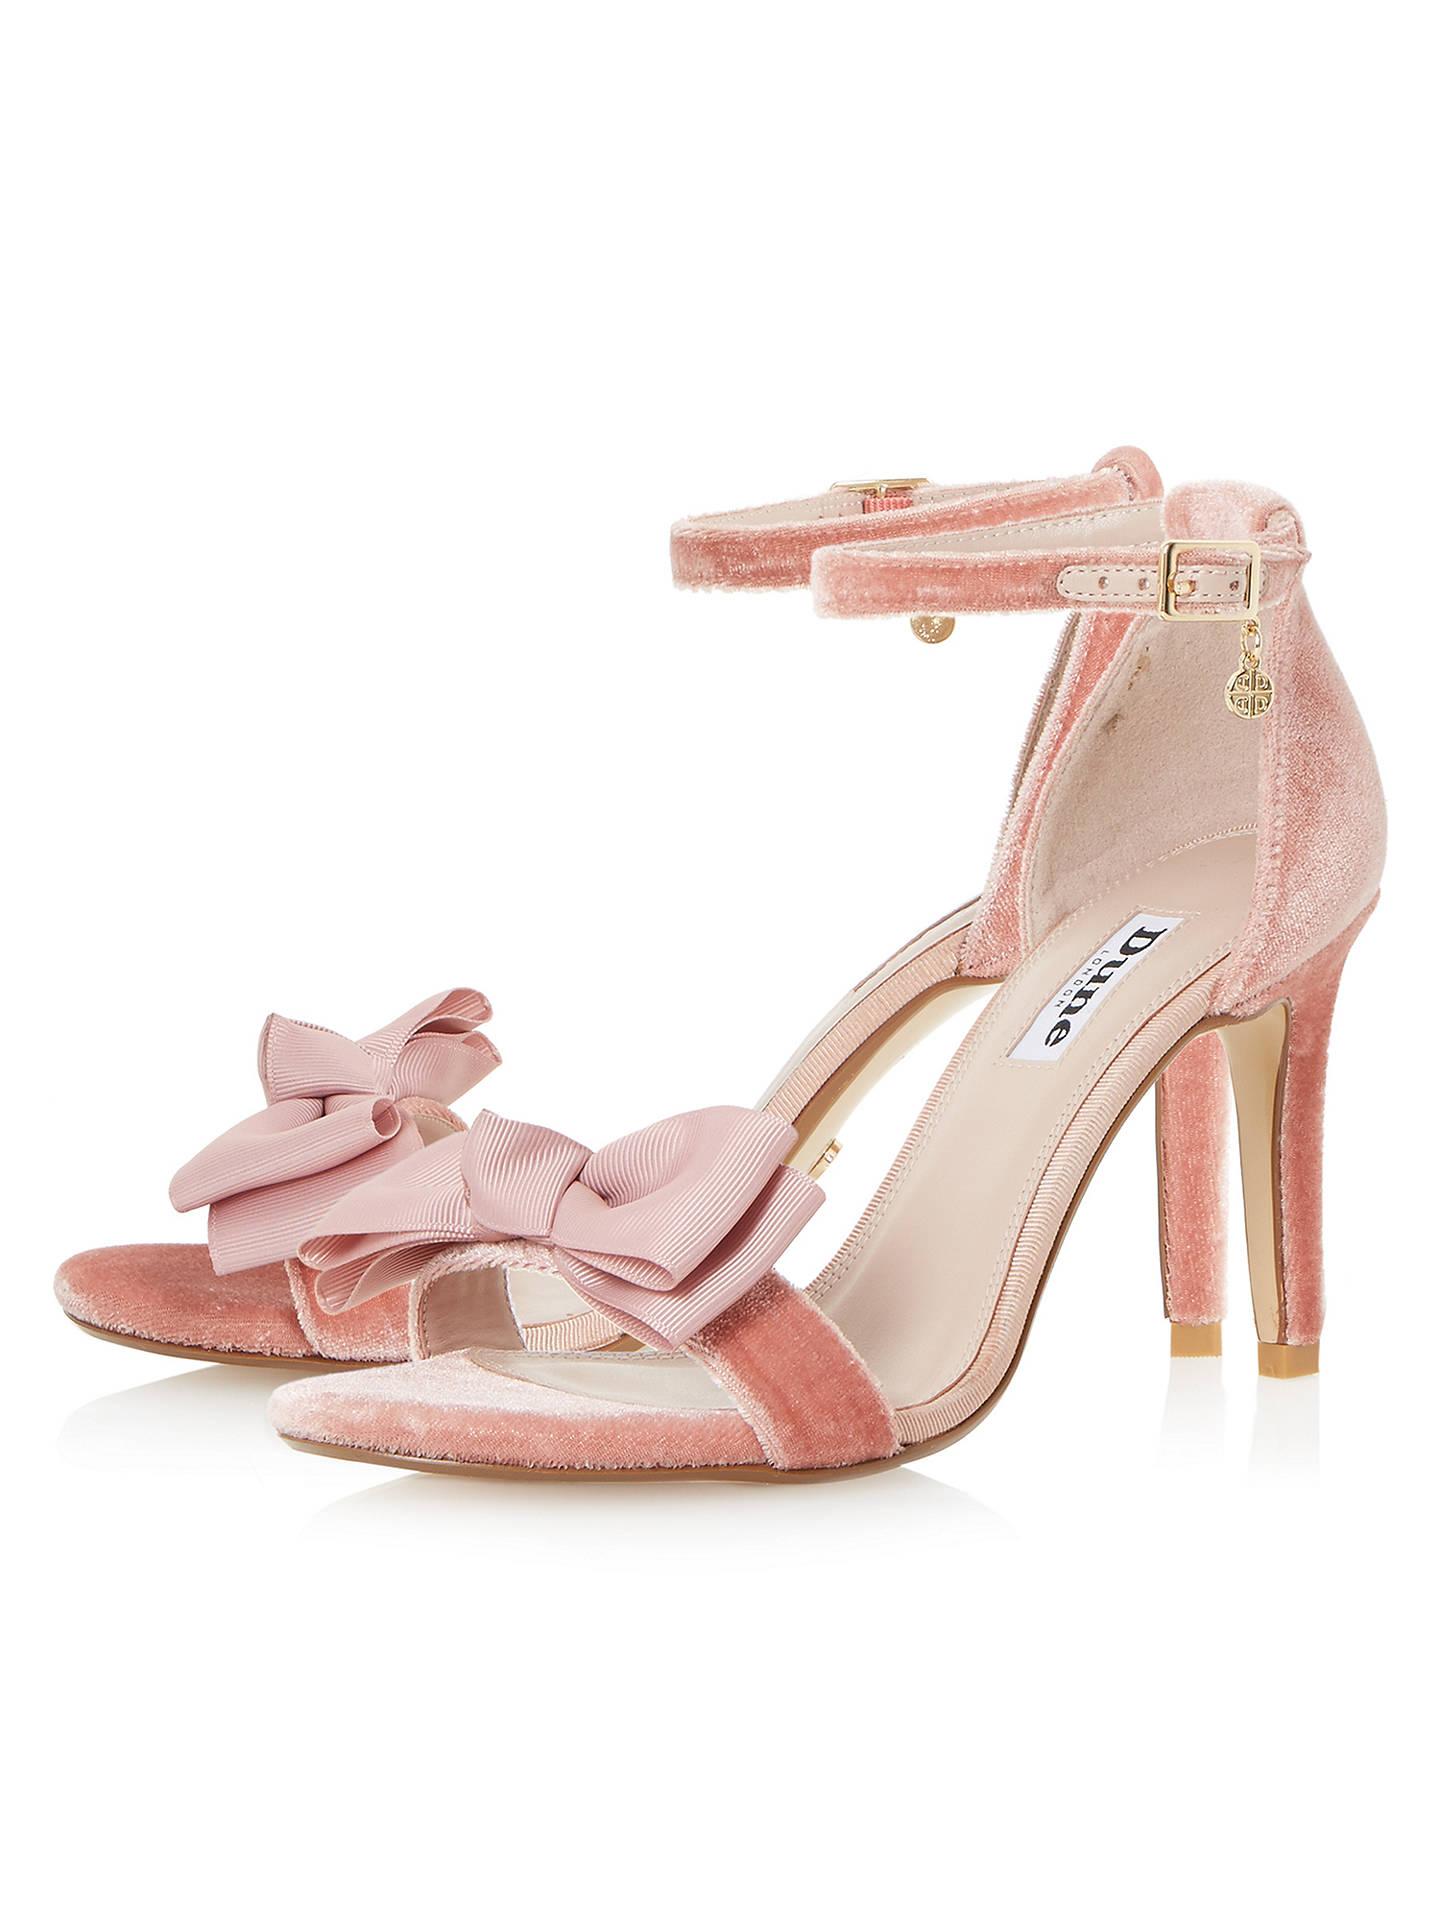 afdba047b46 Dune Moella Bow Stiletto Sandals at John Lewis   Partners